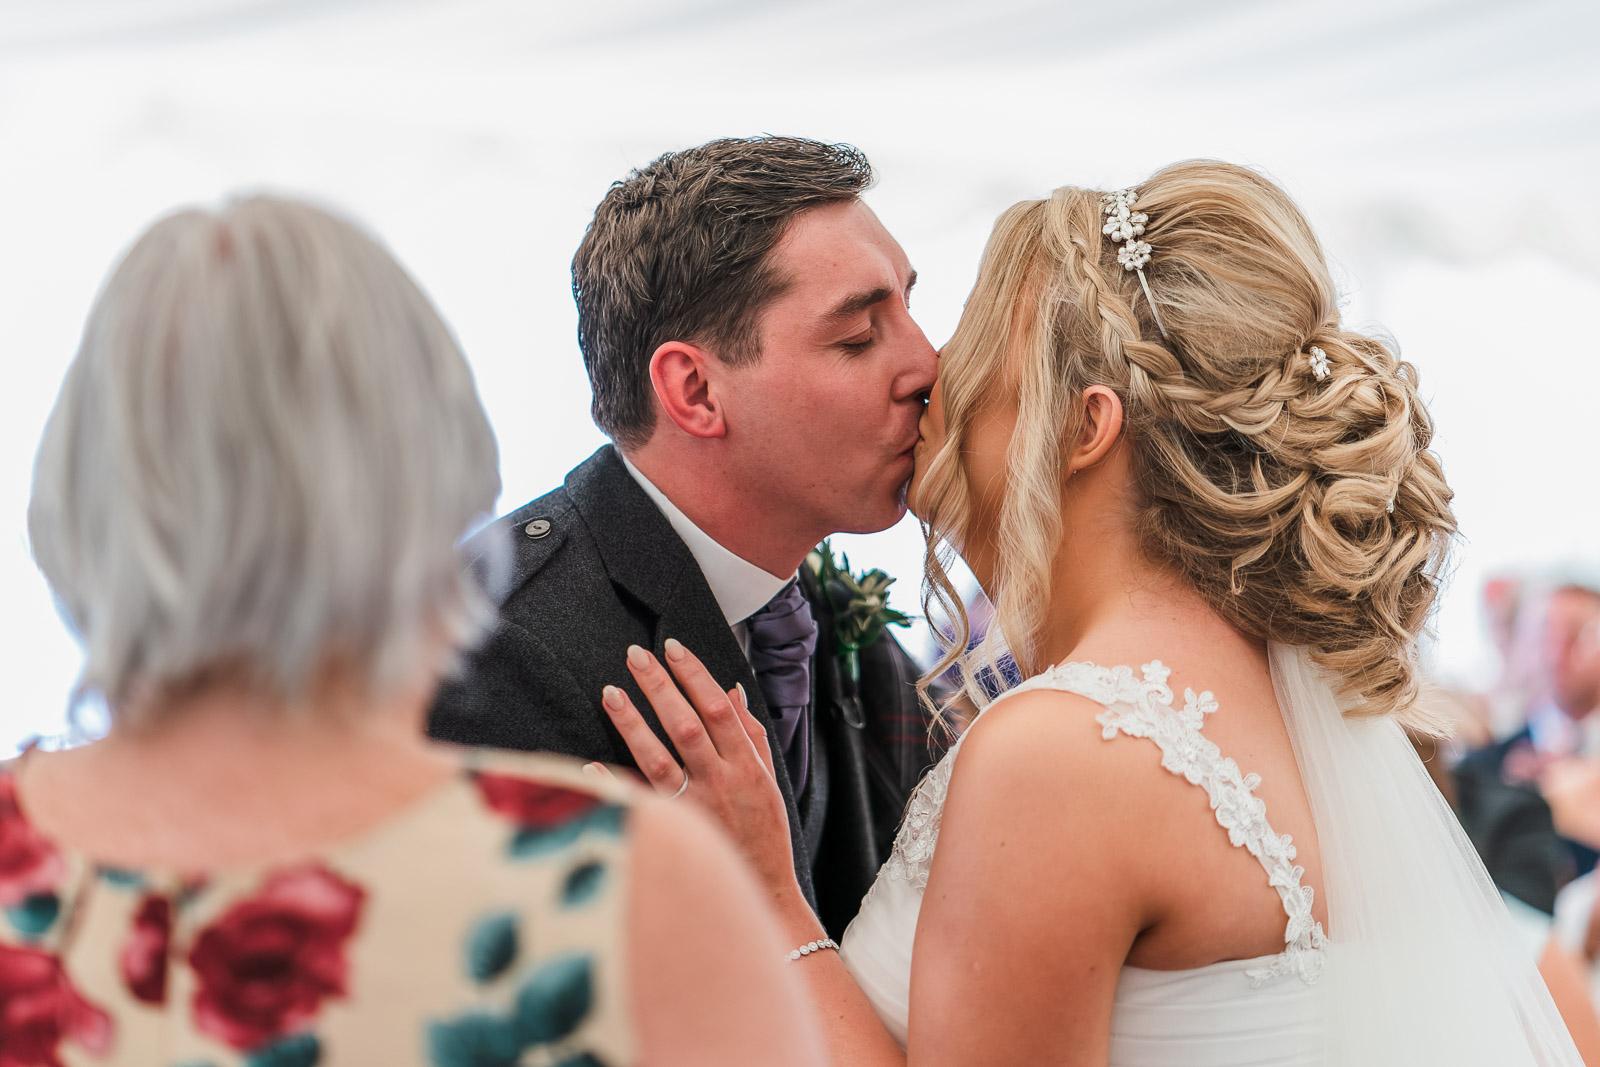 cornhill_castle_wedding_biggar_dearlyphotography (140 of 448).jpg